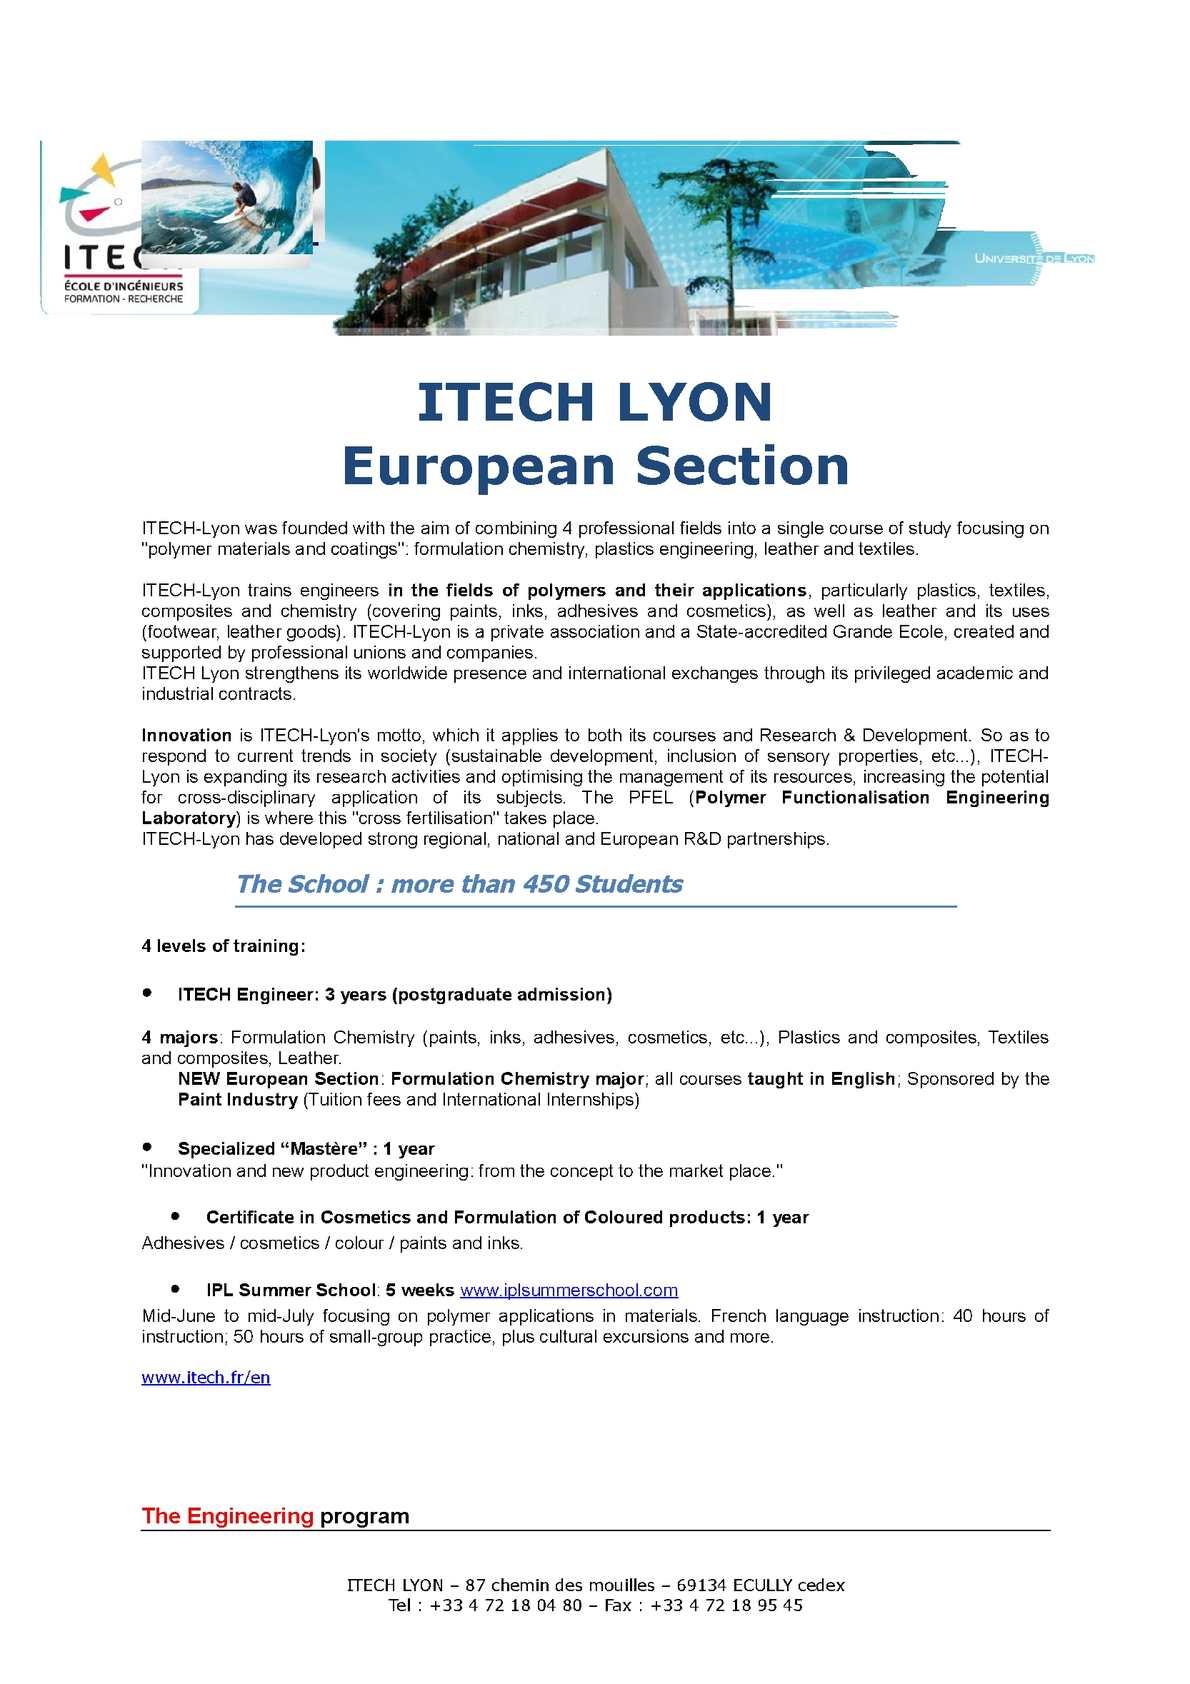 Calaméo - Itech European School Of Formulation Chemistry